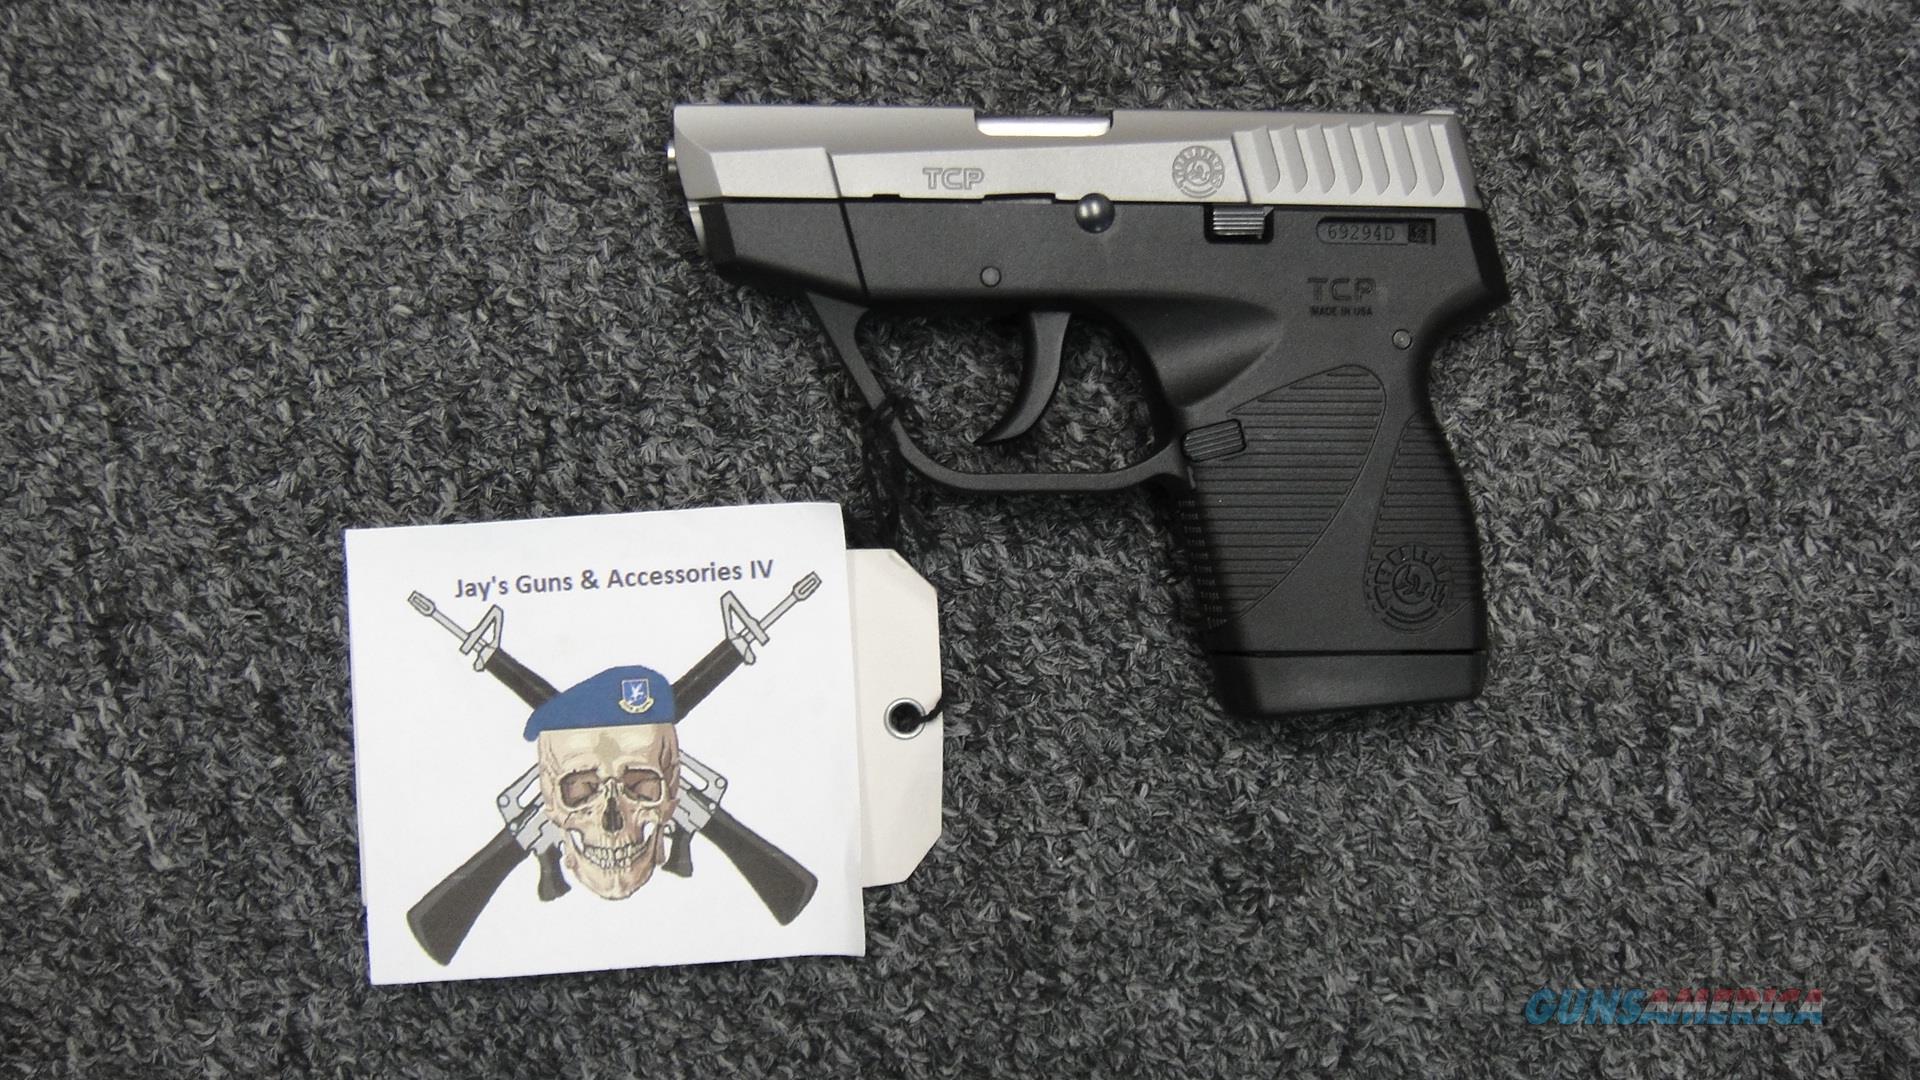 Taurus PT738 TCP Two Tone .380ACP  Guns > Pistols > Taurus Pistols > Semi Auto Pistols > Polymer Frame